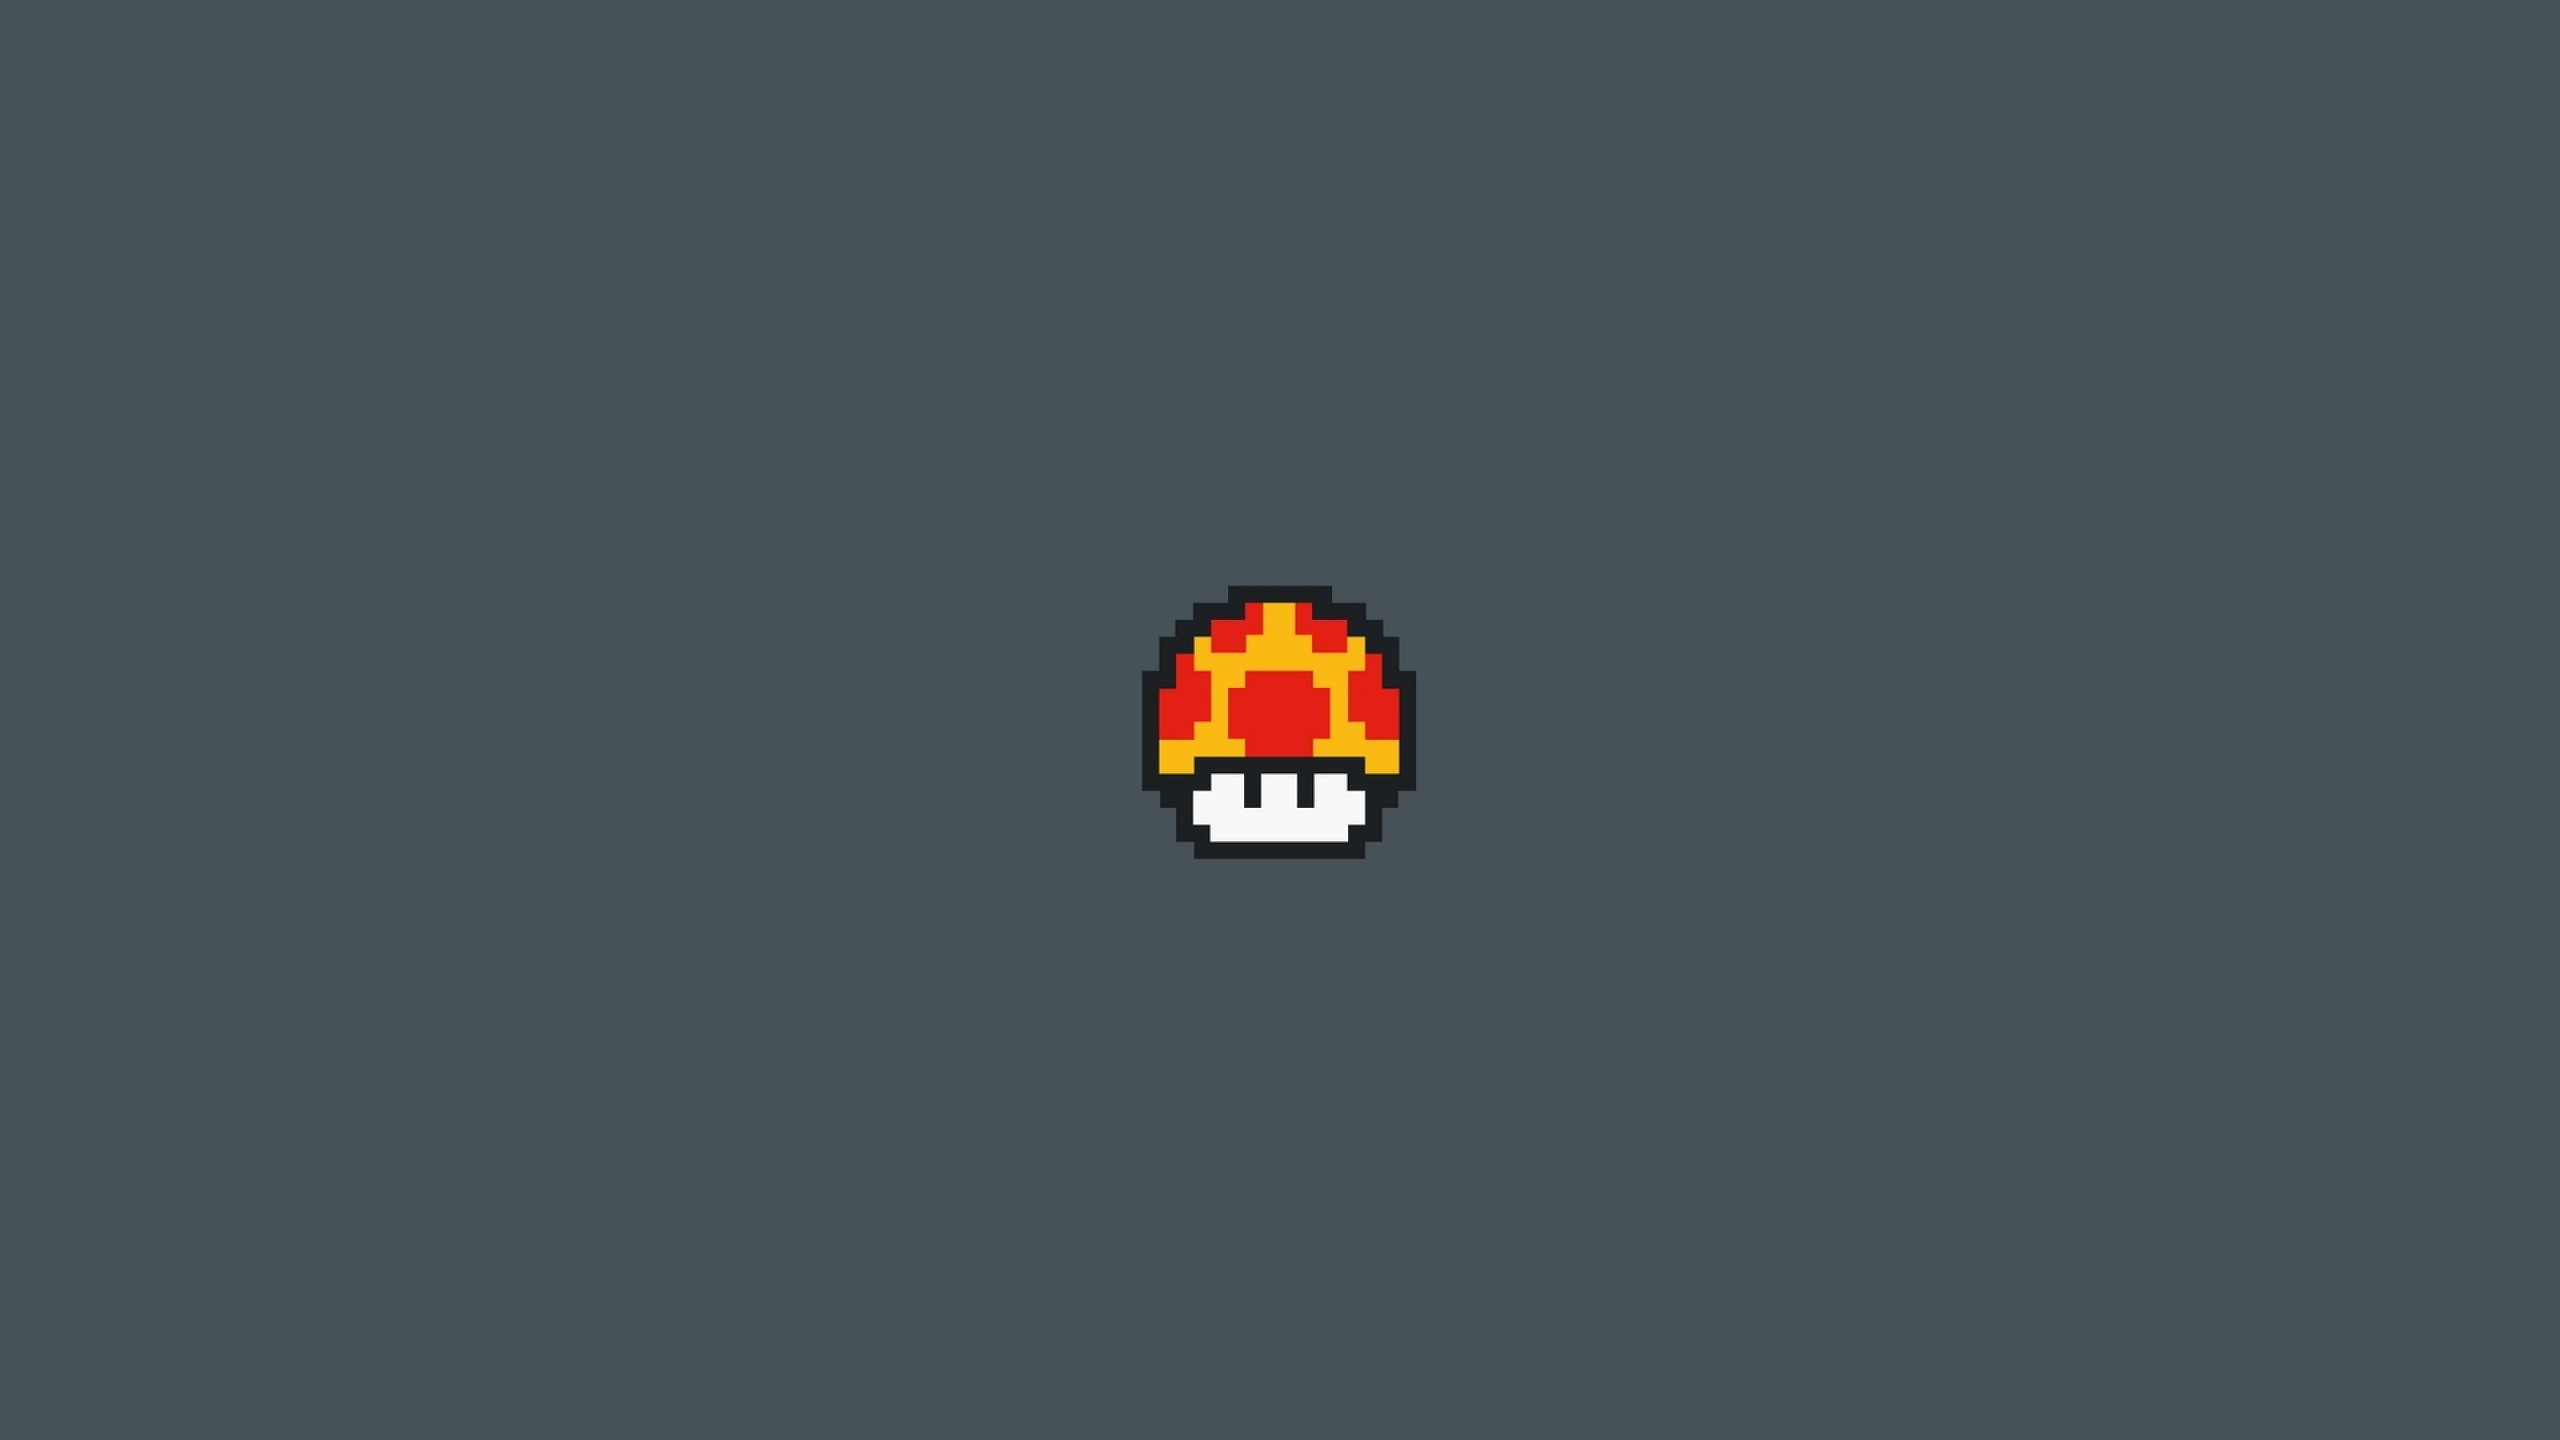 … Download Wallpaper Mario, Spots, Game, Minimalism Mac …  Download Wallpaper Mario, Spots, Game, Minimalism Mac .